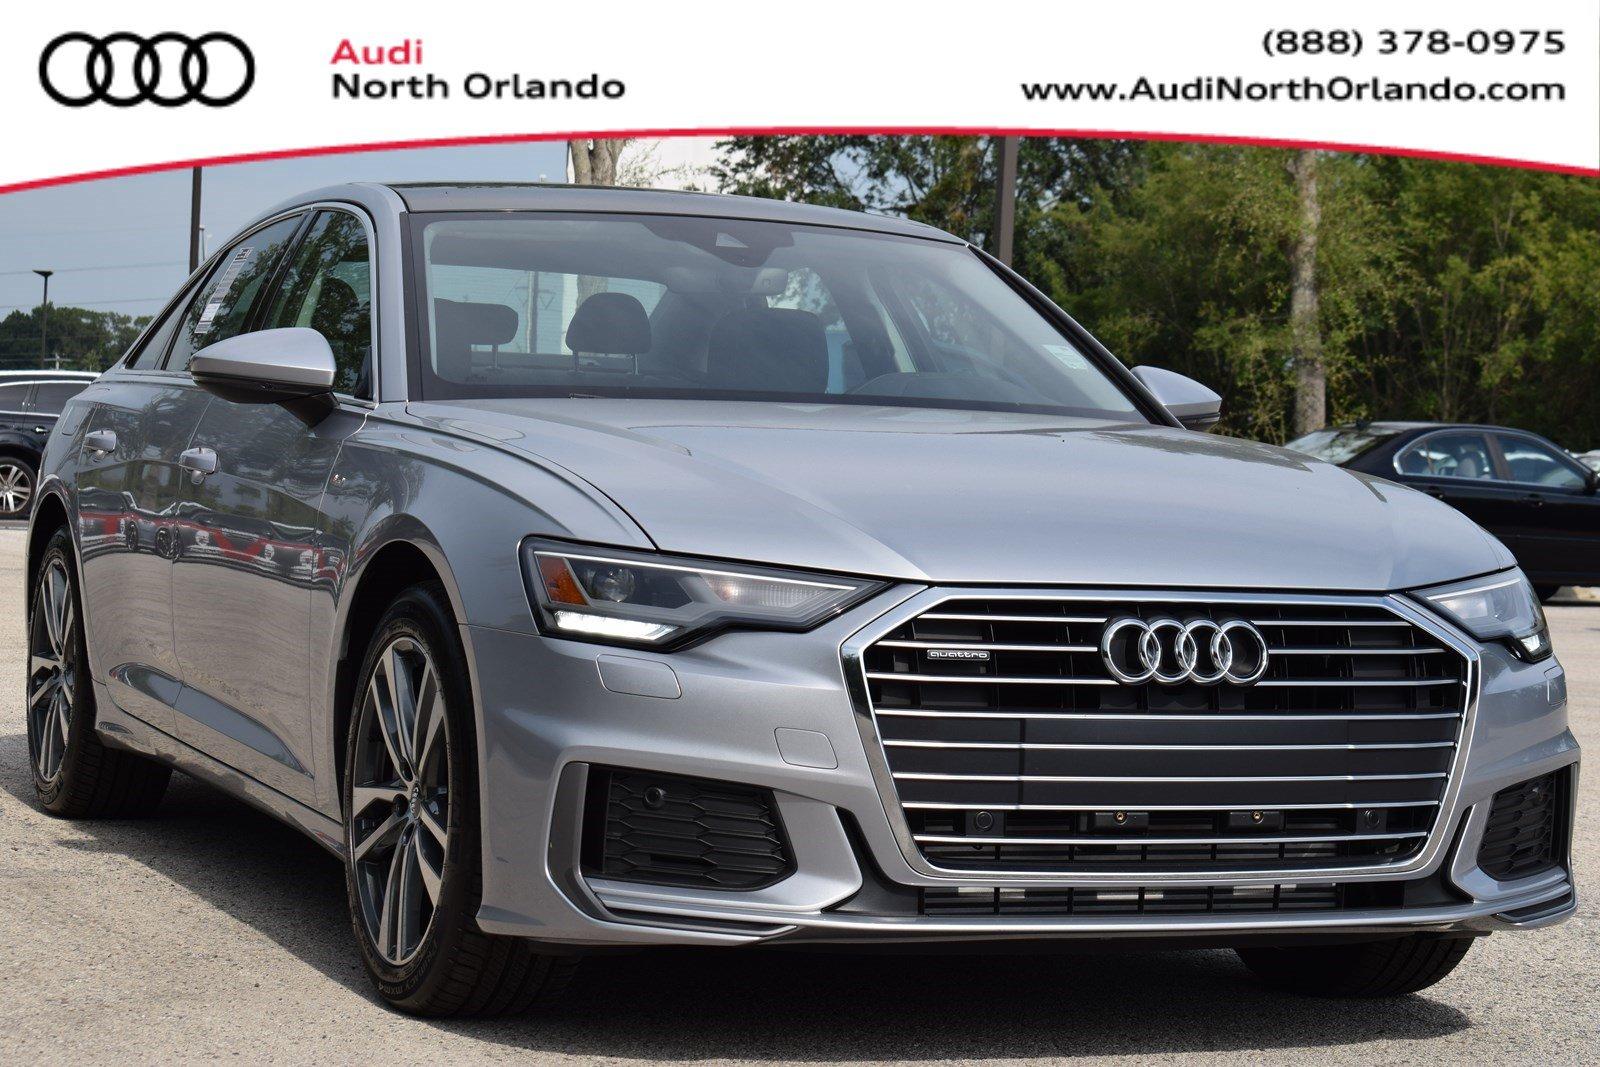 Featured new 2019 Audi A6 3.0T Premium Sedan for sale in Sanford, FL, near Orlando, FL.